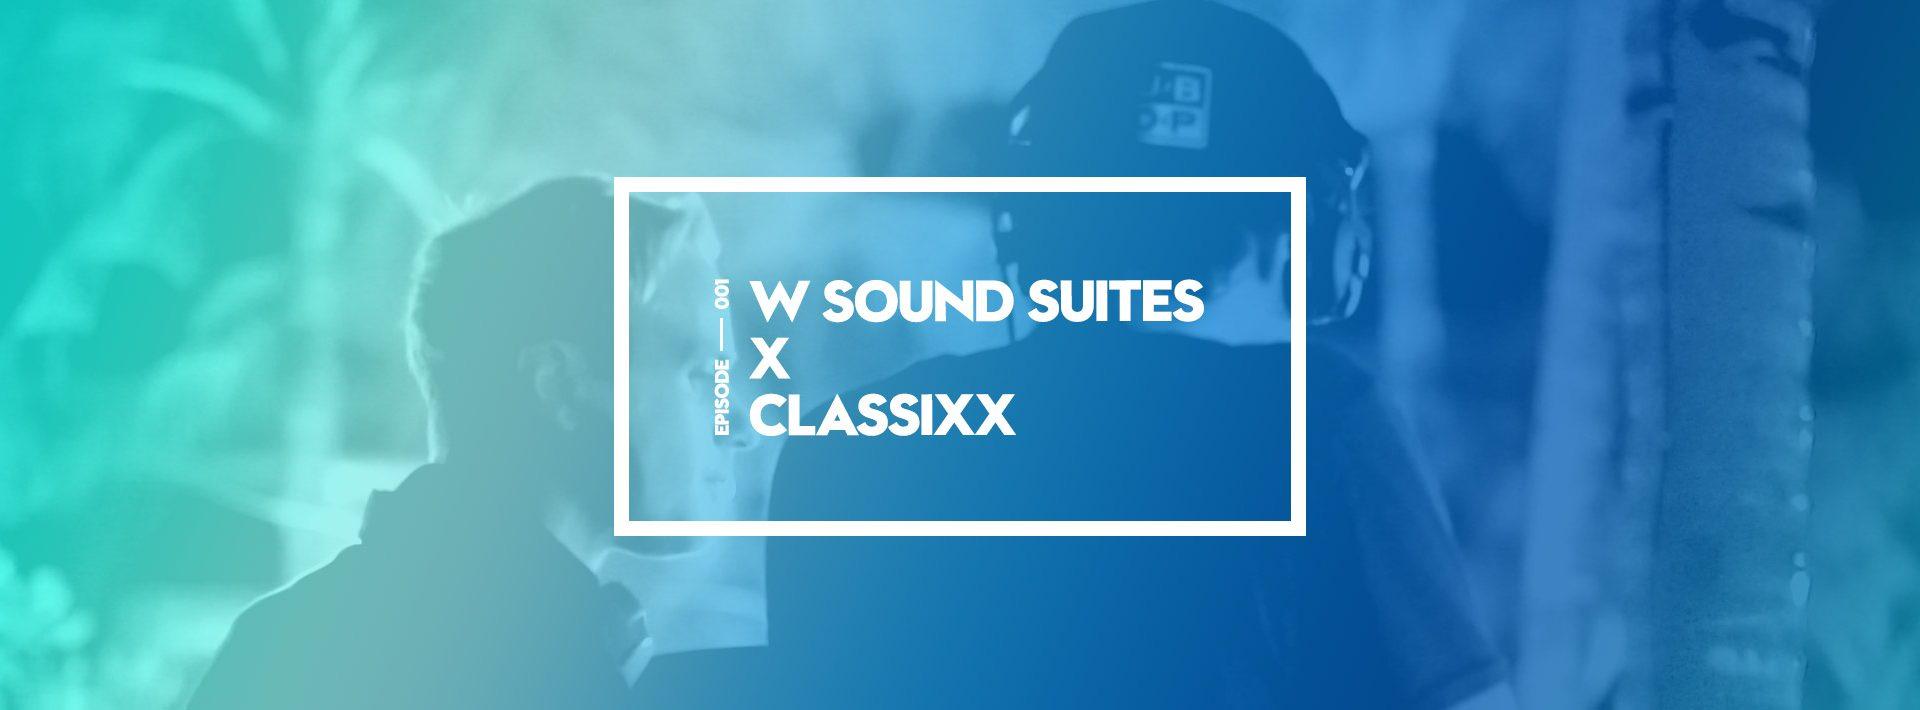 2016_07_20_Whotels_Classix-Podcast_desktop03